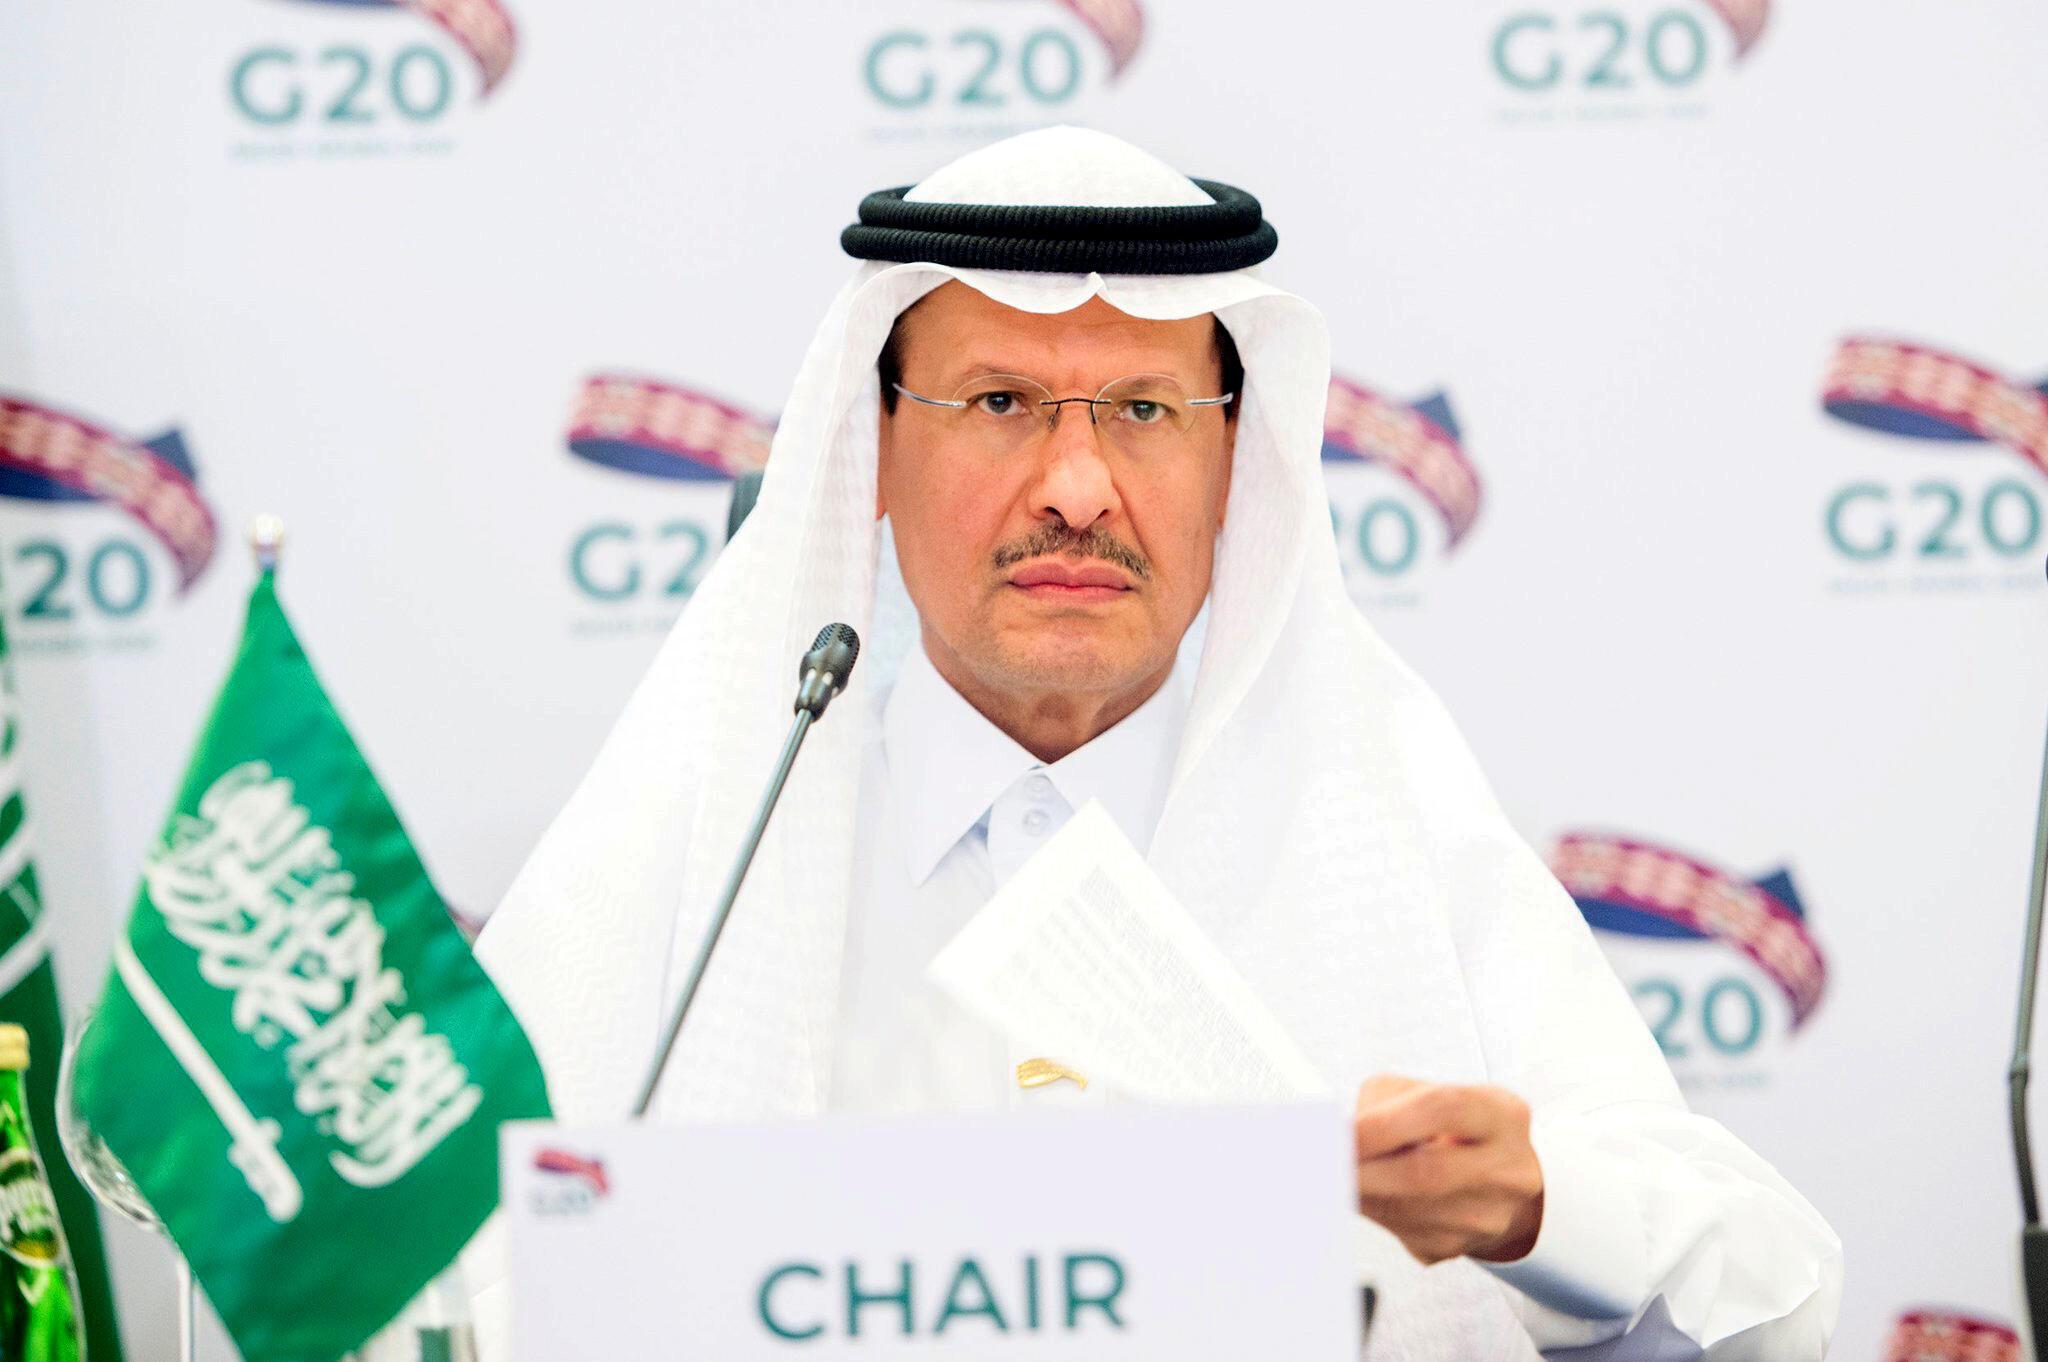 2020-04-10T164349Z_1318941658_RC2S1G9H25PH_RTRMADP_3_GLOBAL-OIL-G20-ENERGY